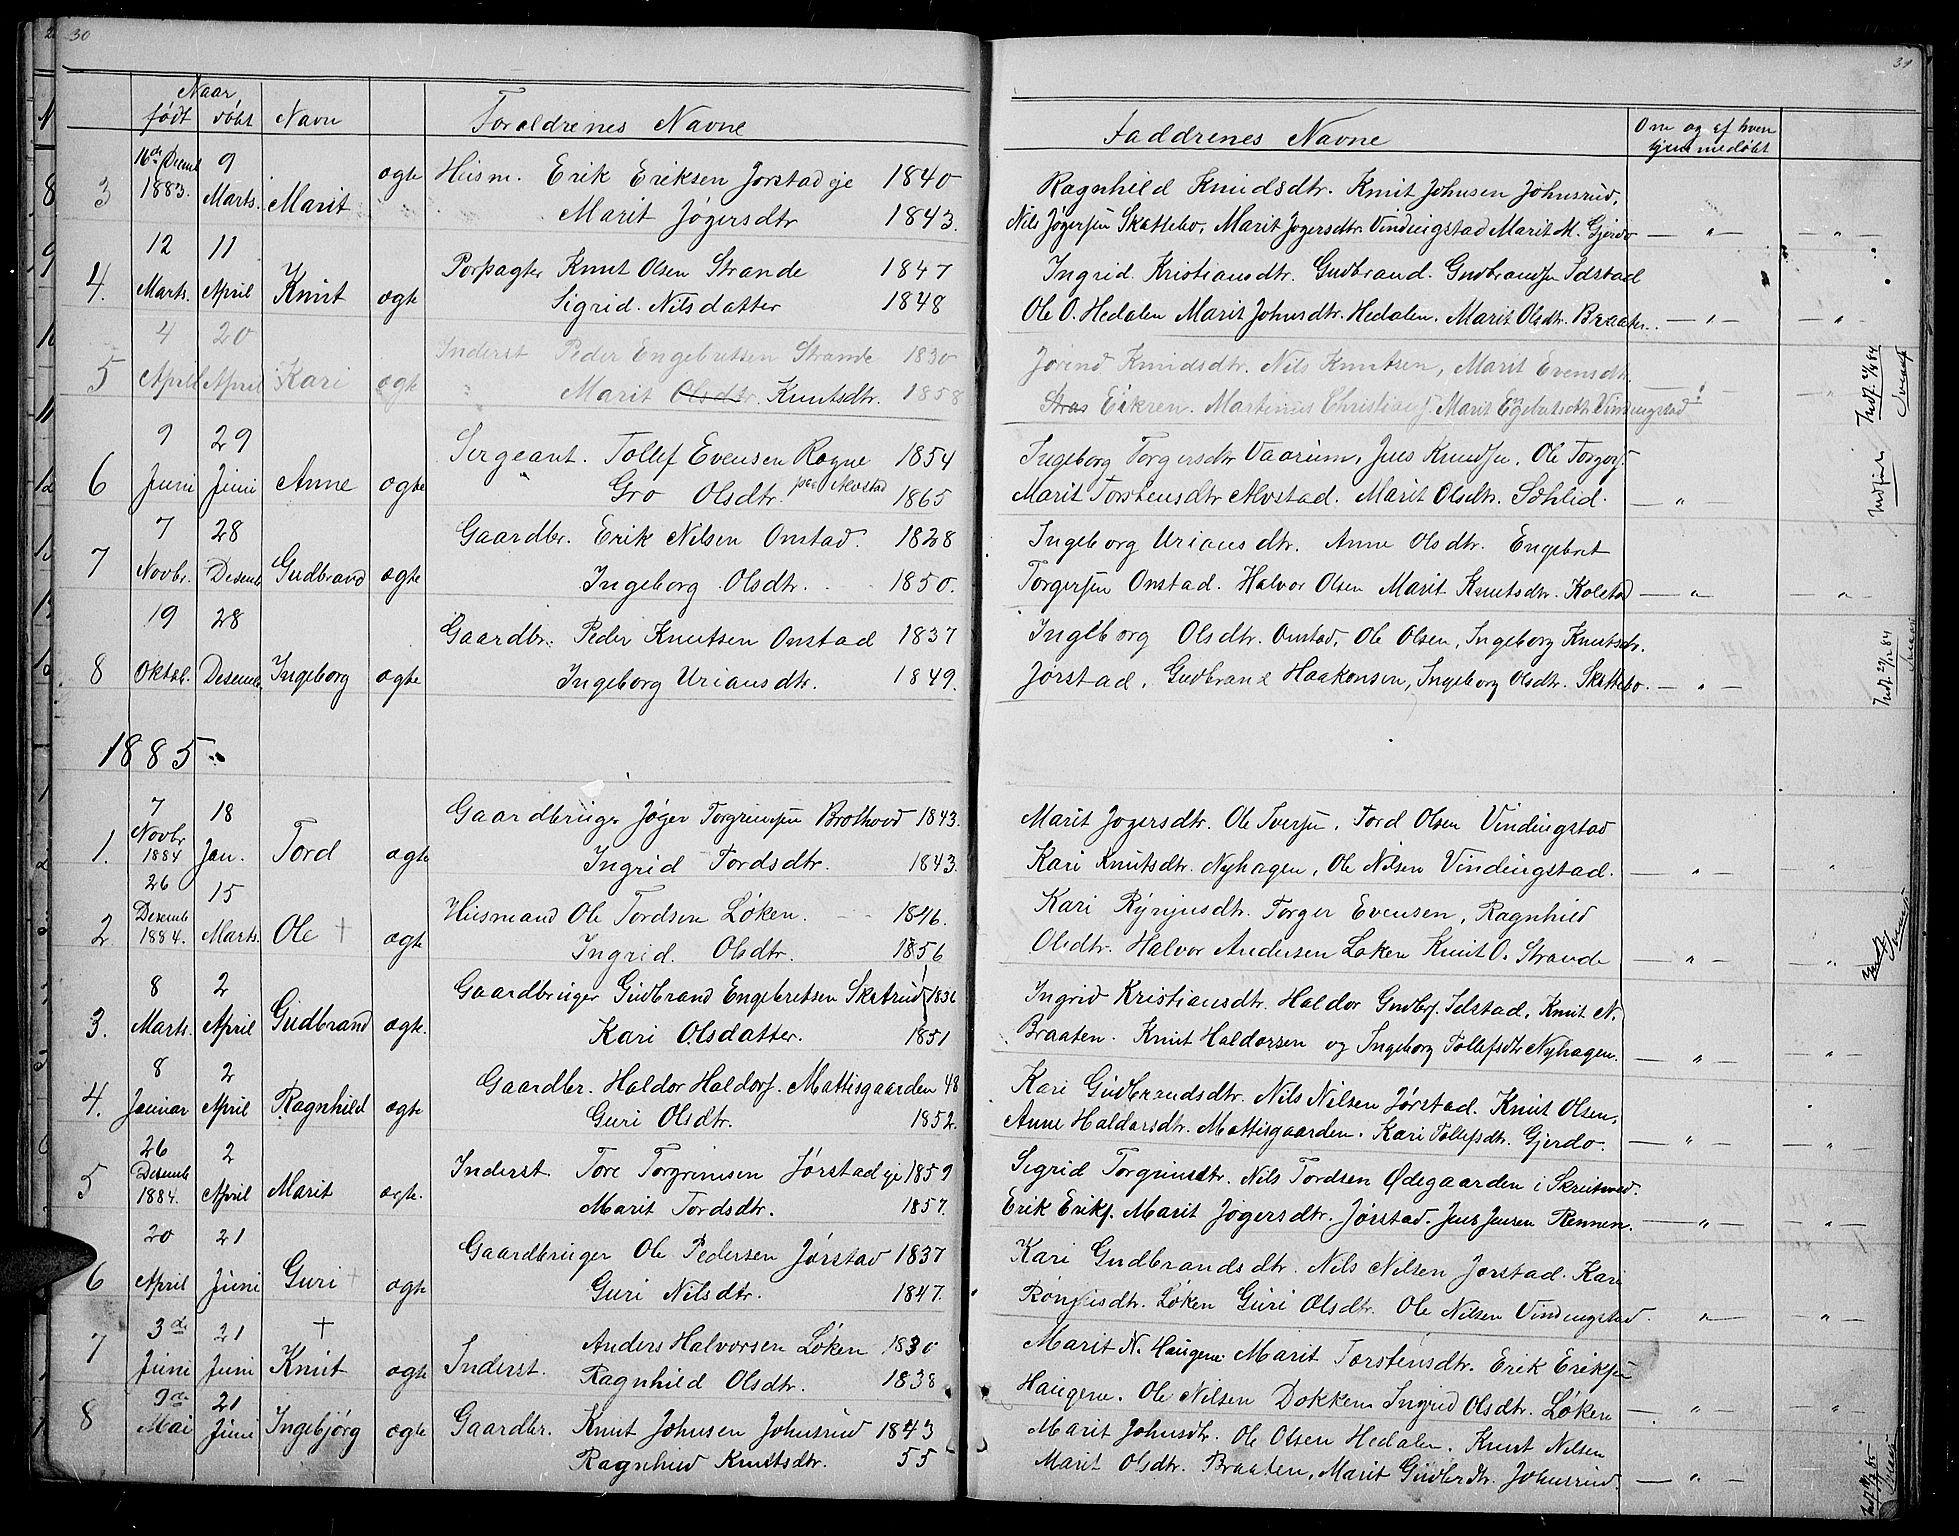 SAH, Øystre Slidre prestekontor, Klokkerbok nr. 2, 1866-1886, s. 30-31